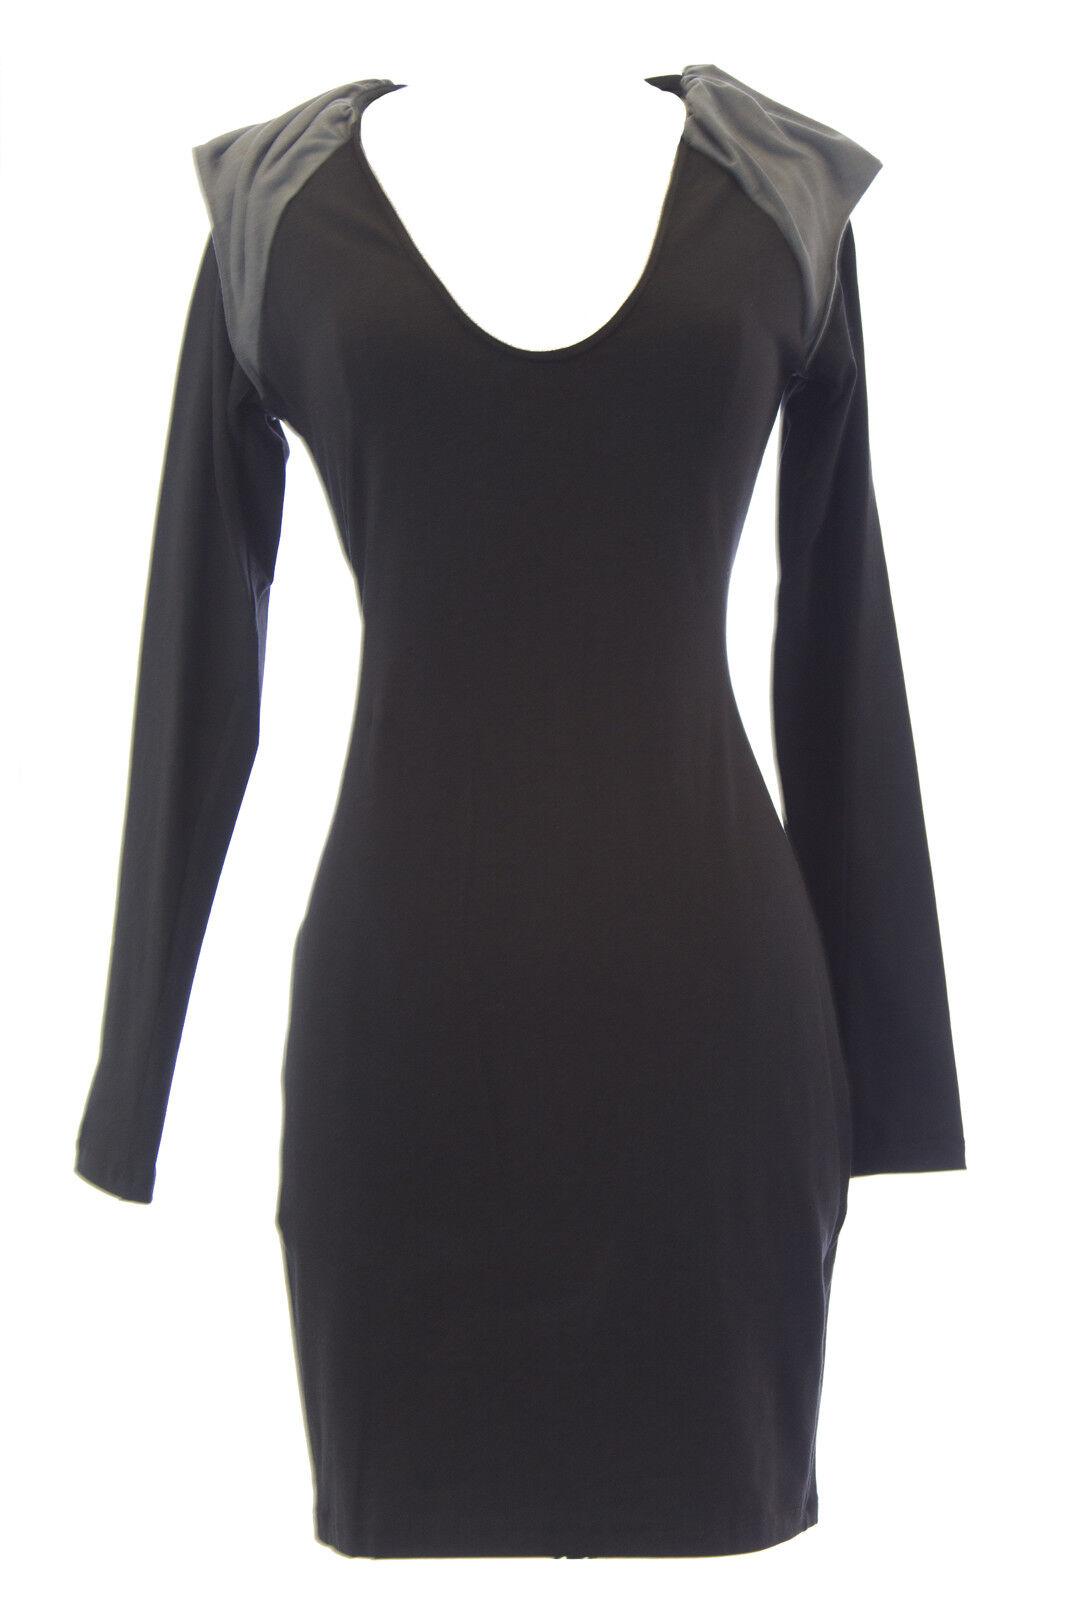 Vena Cava Damen Schwarz Pete Rock Langärmeliges Kleid 60801 Neu